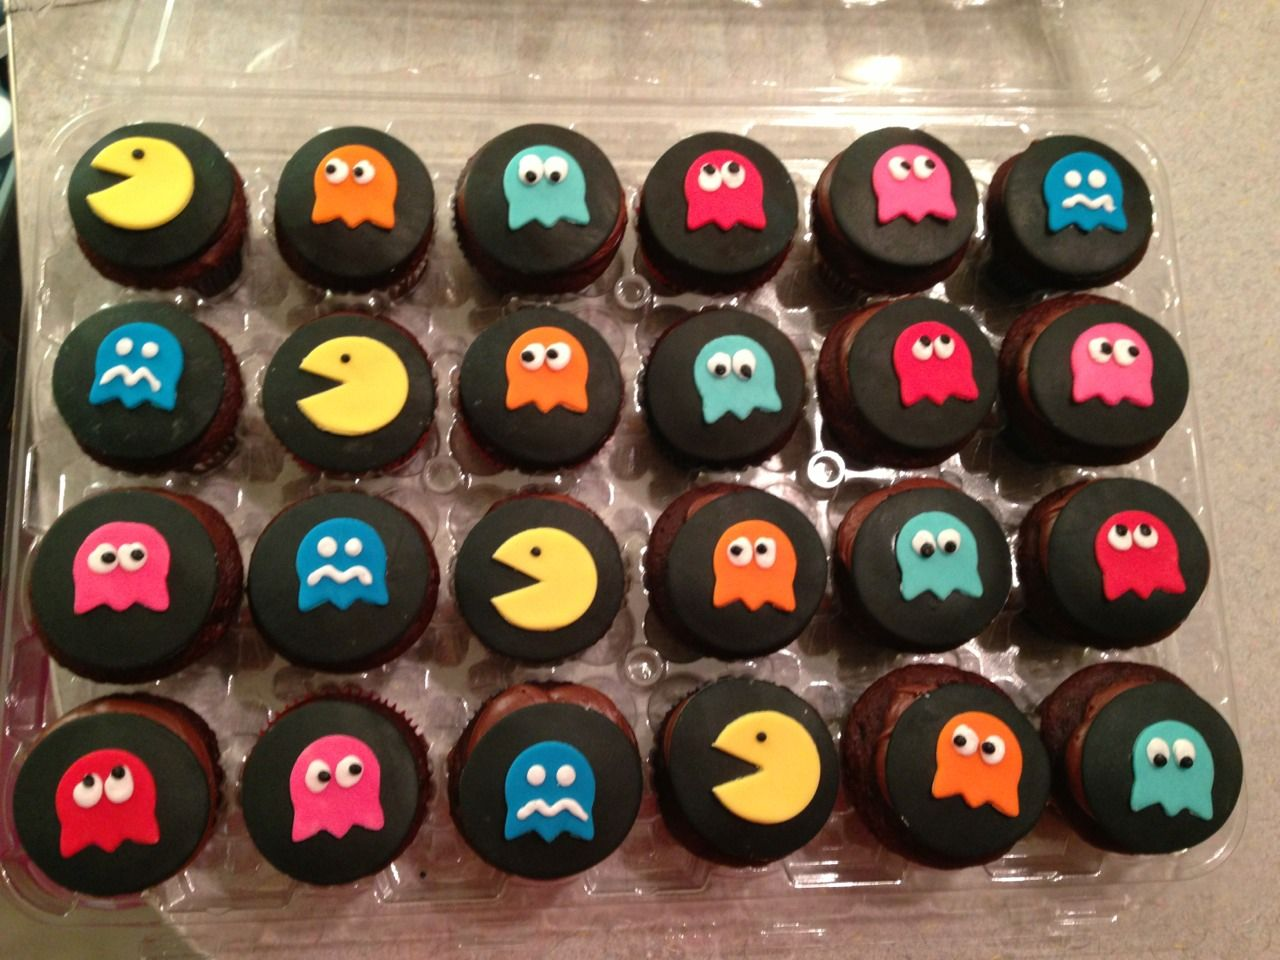 Google themes pacman - Pacman Cupcakes Google Search